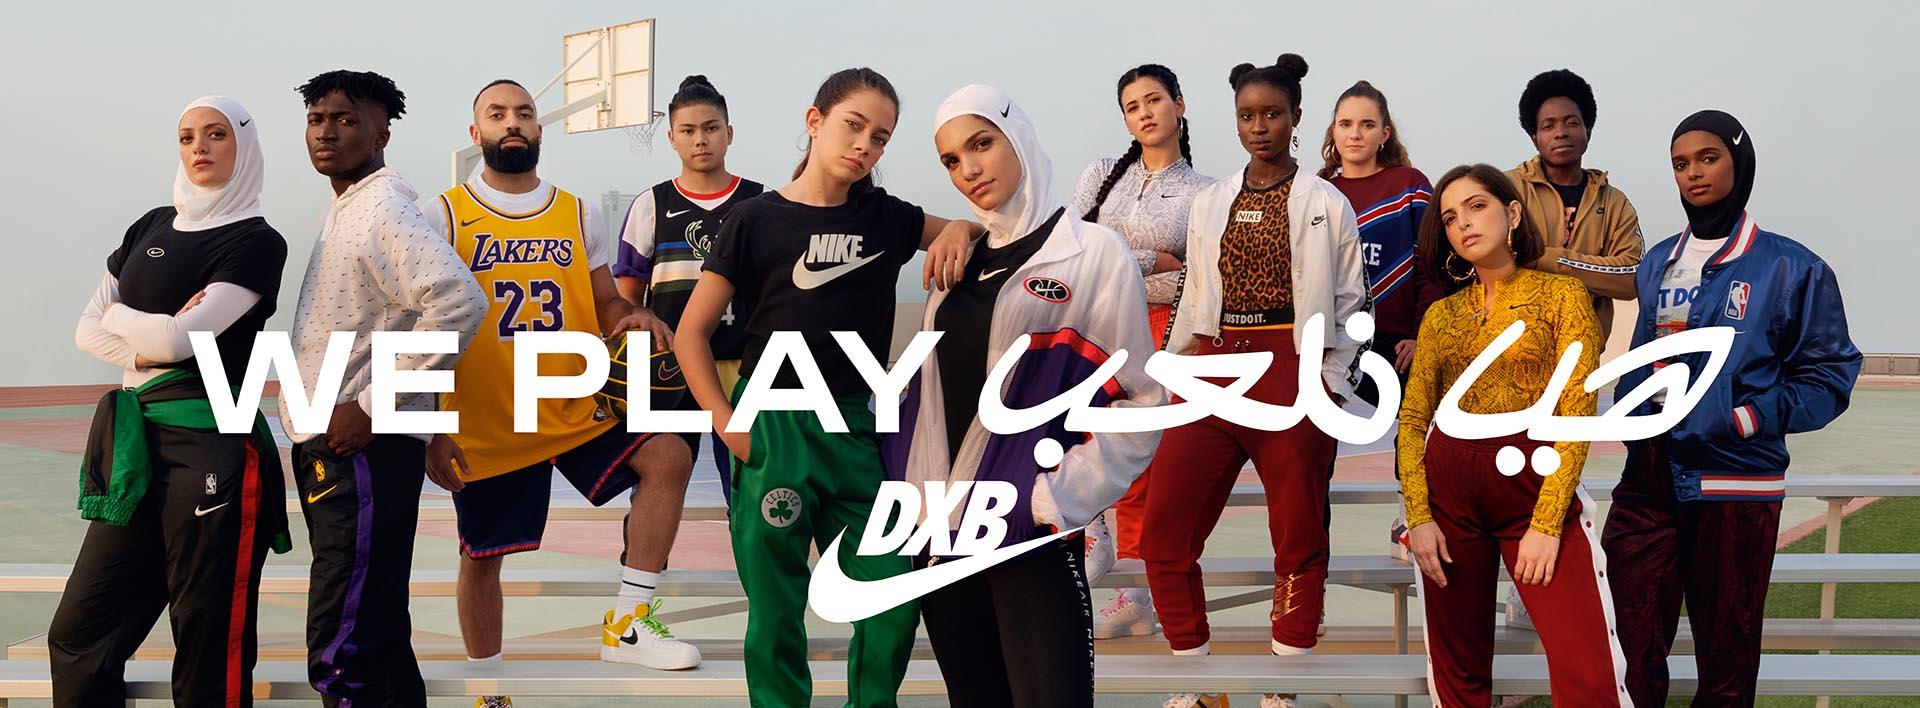 NIKE : DXB campaign